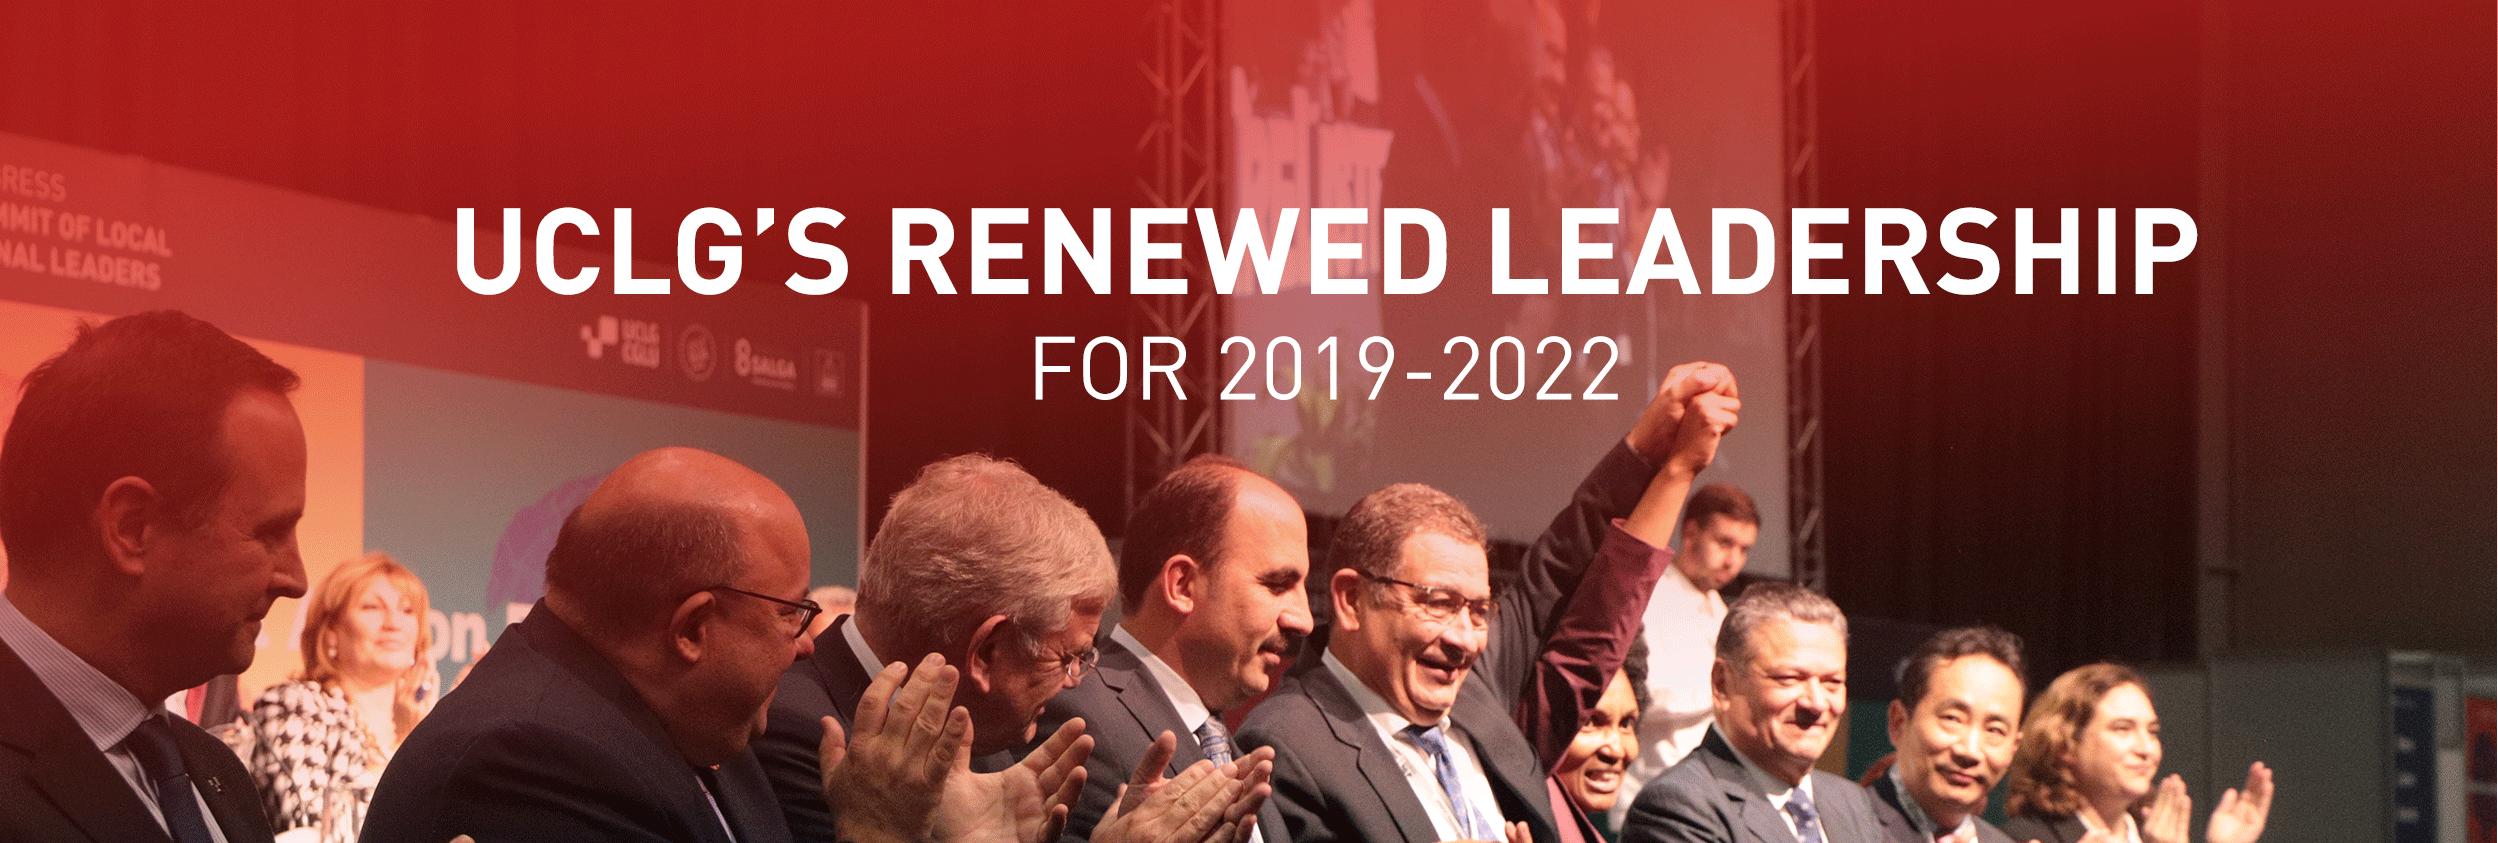 UCLG's Renewed Leadership